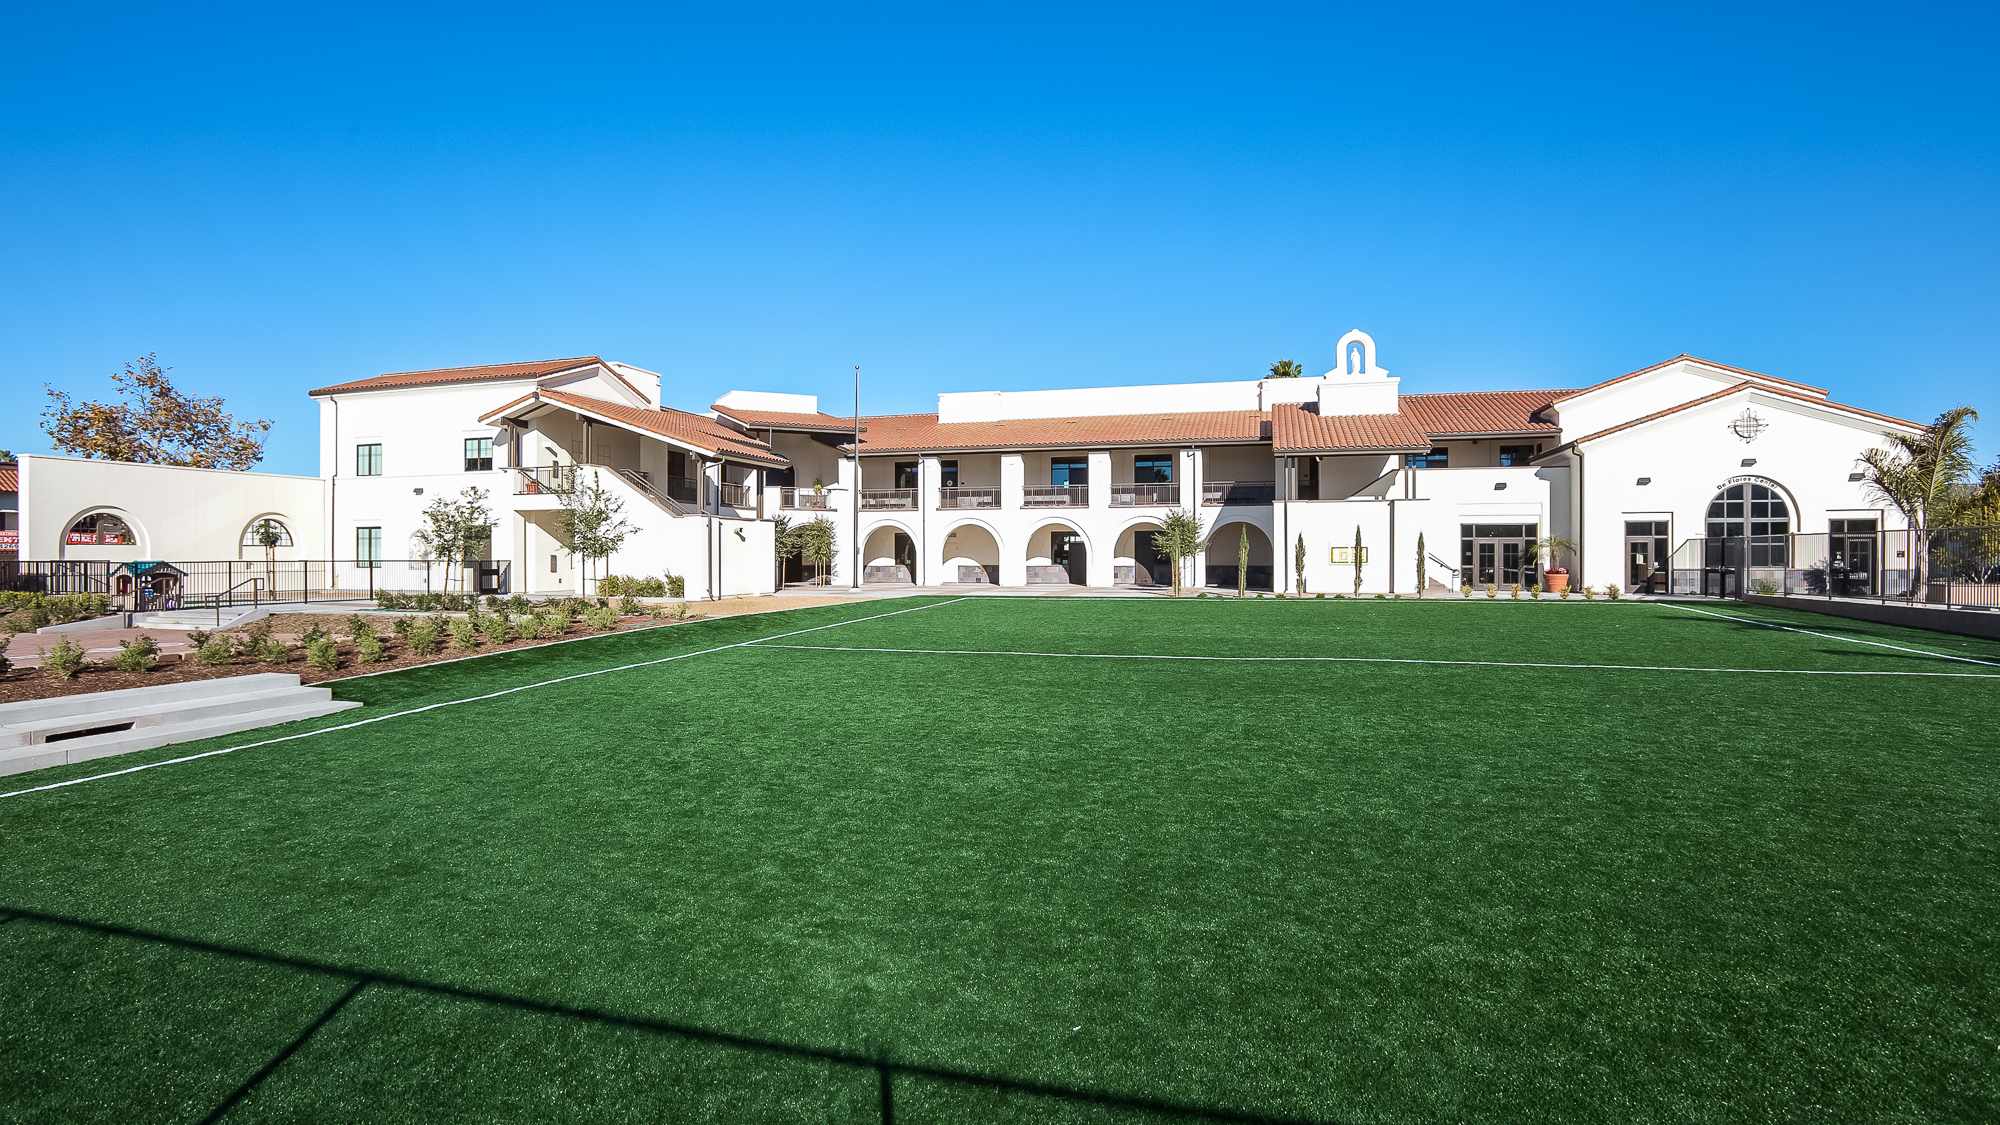 St-Rose-Lima-domusstudio-educational-architecture